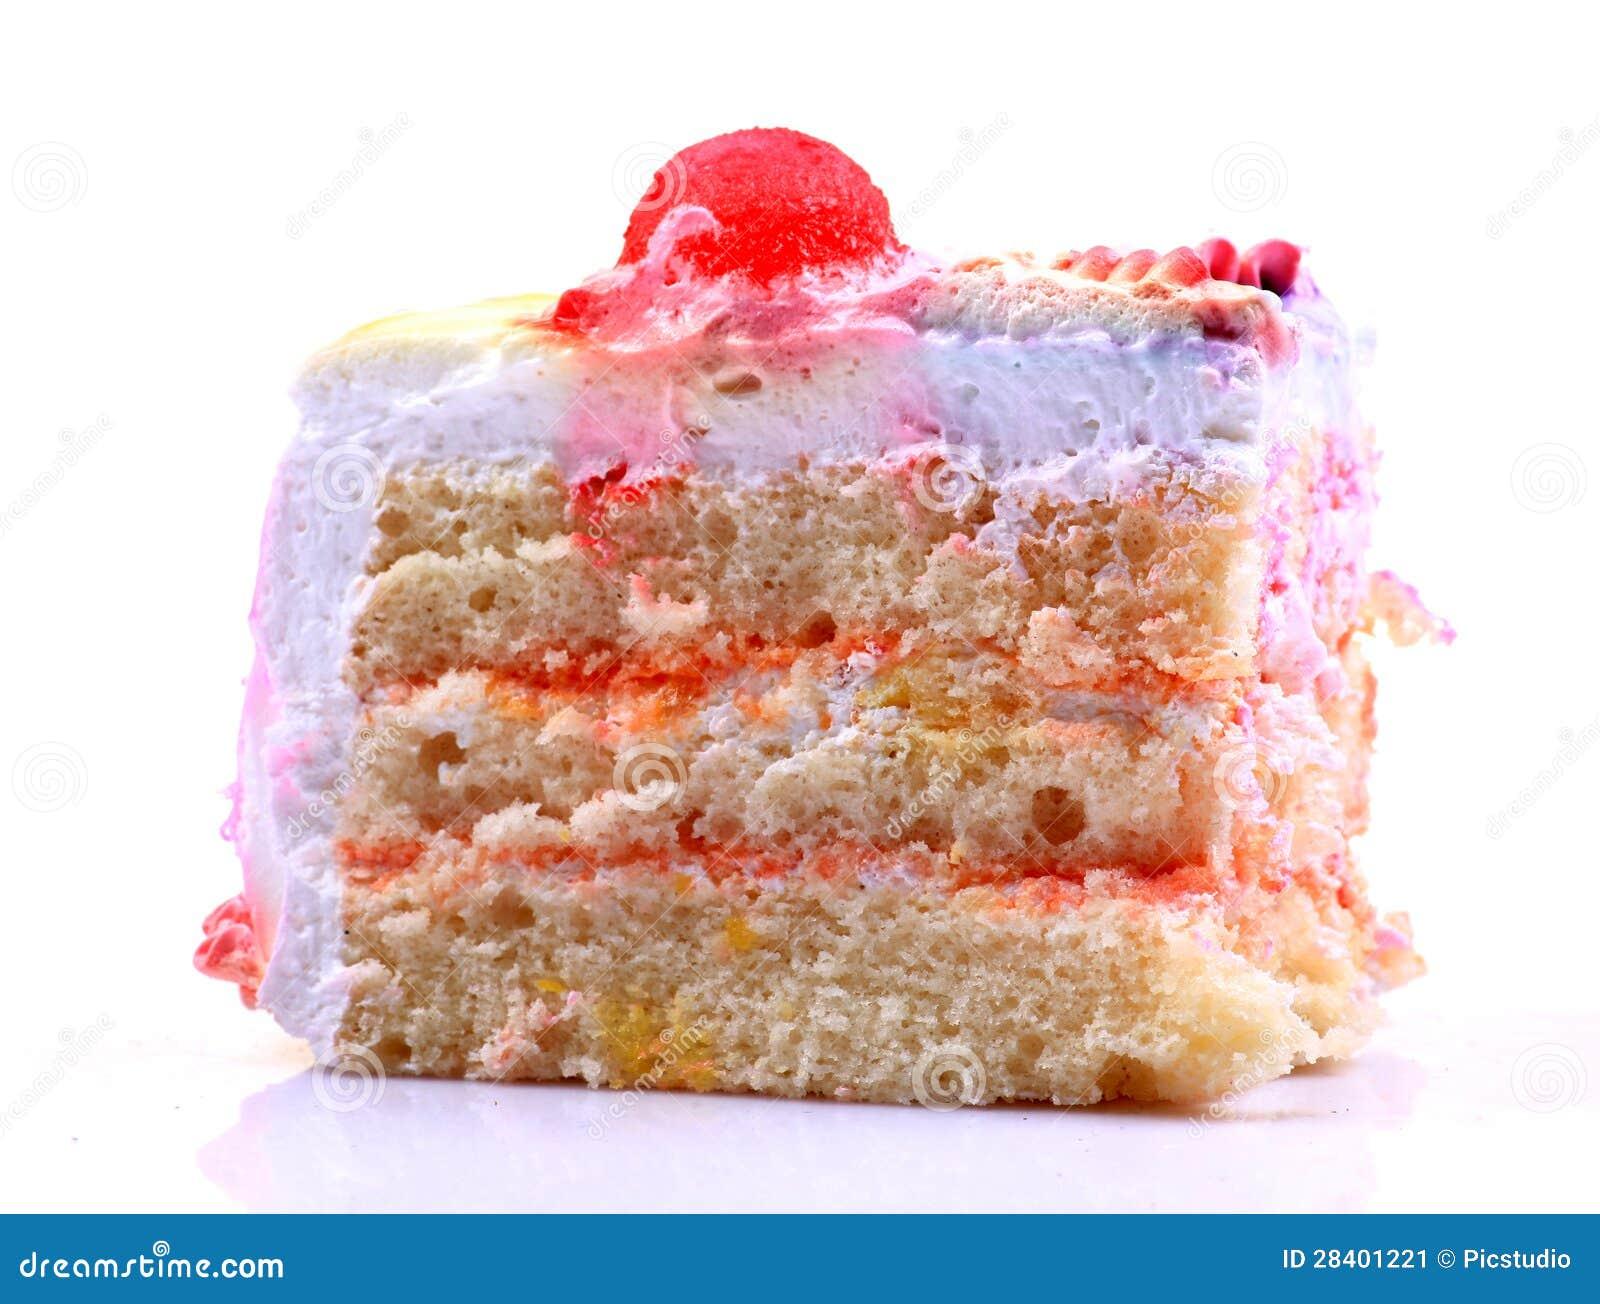 Beautiful Cake Piece Images : Cake Piece Stock Image - Image: 28401221